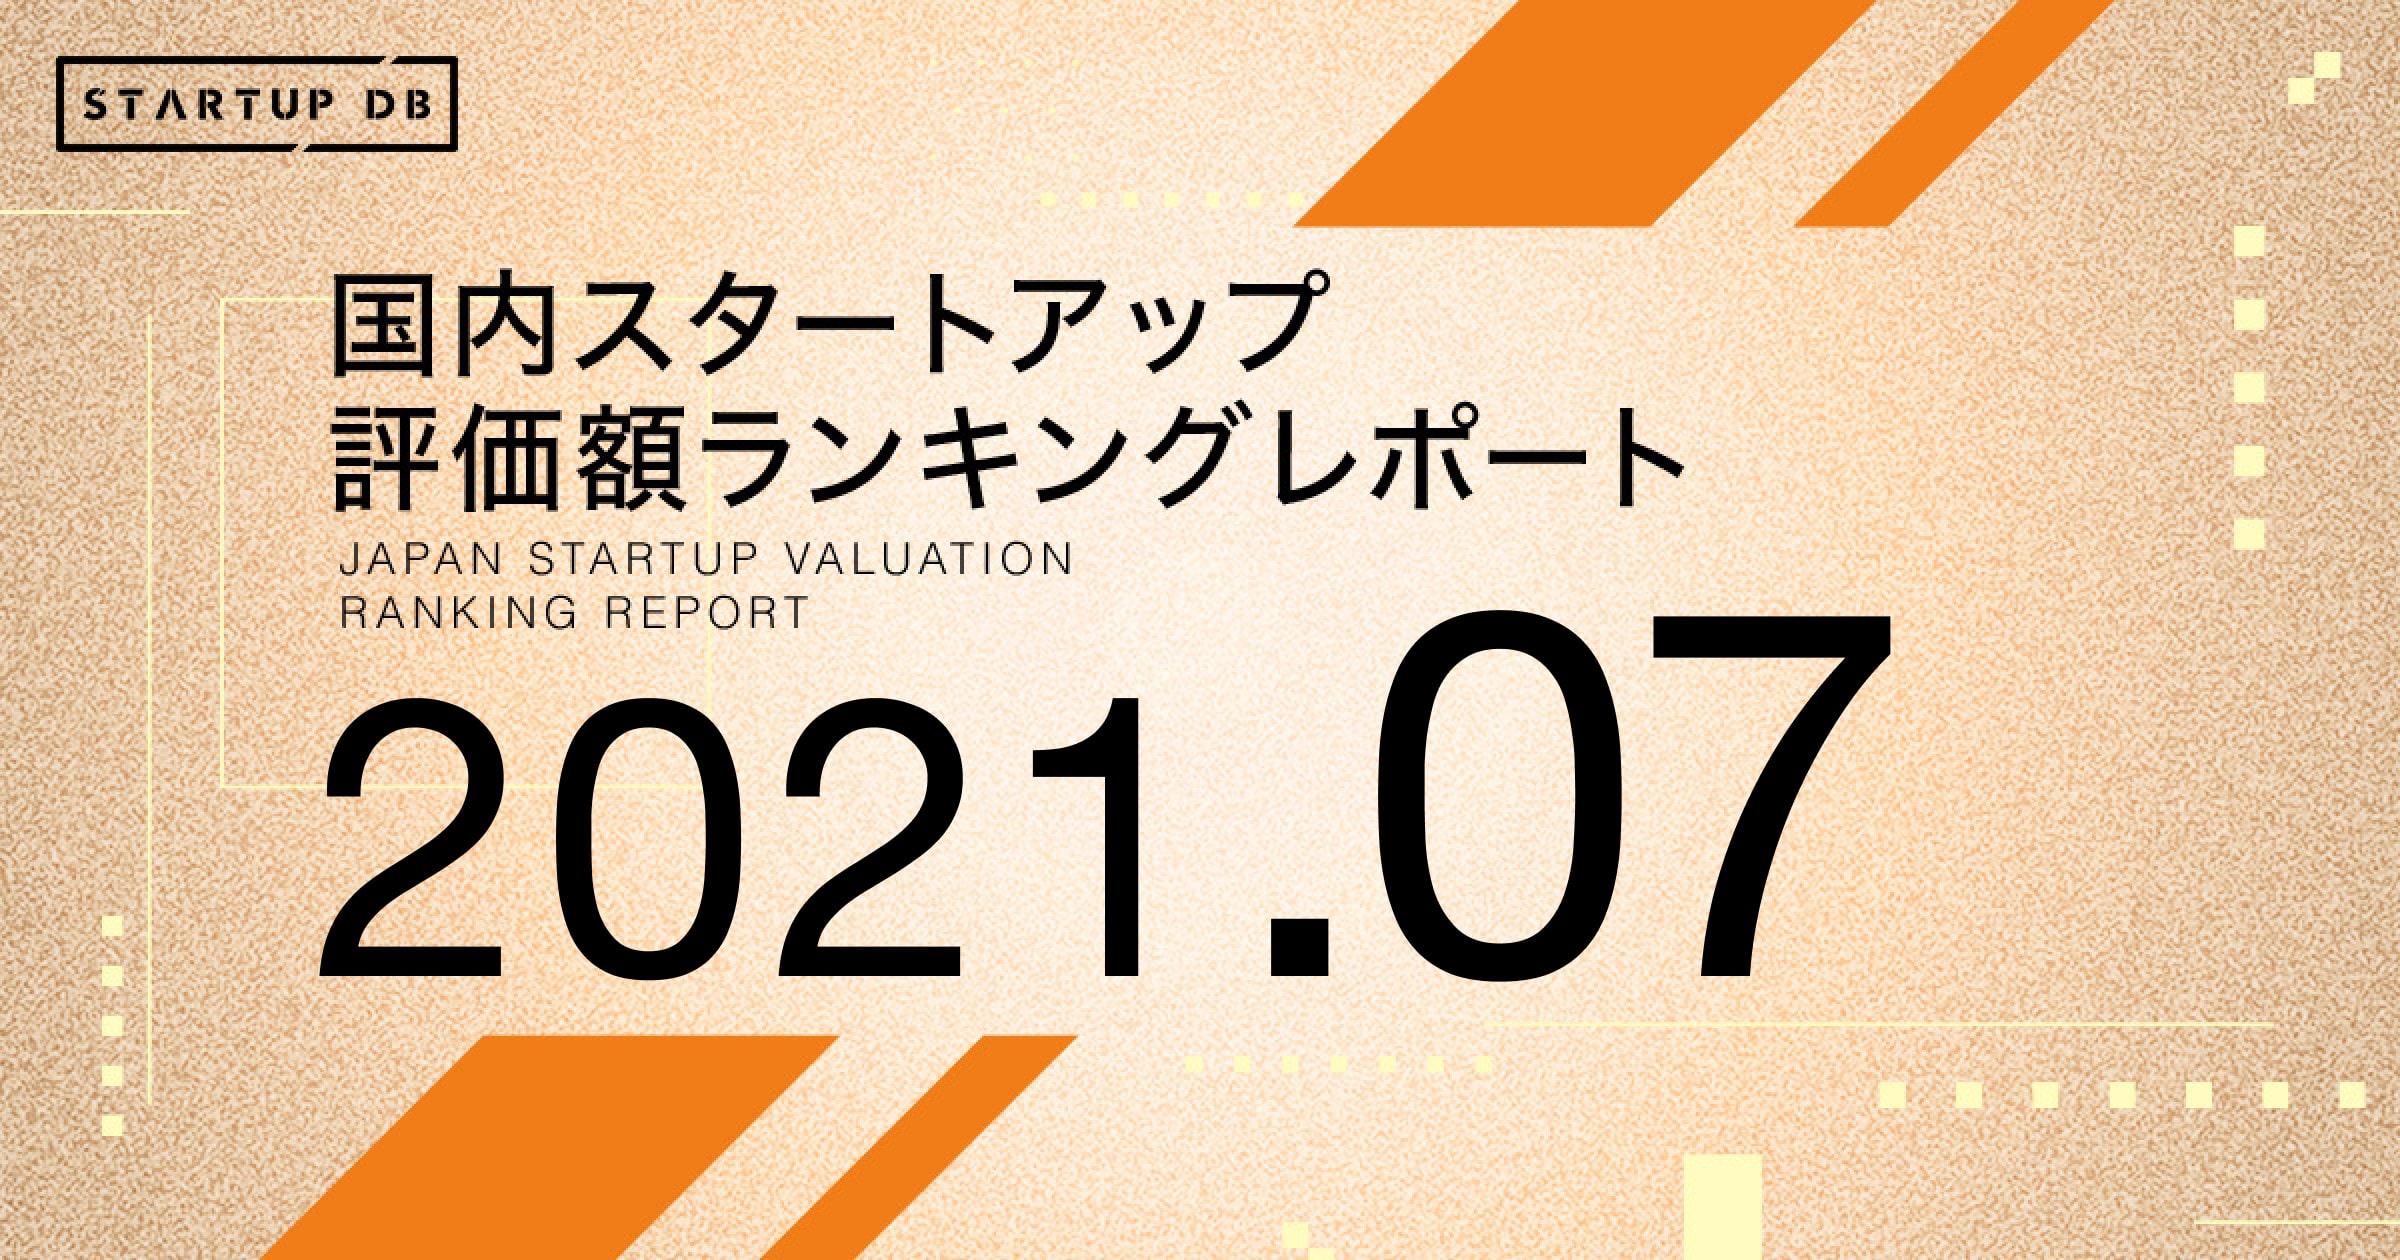 【STARTUP DB】調査結果 国内スタートアップ評価額ランキング(2021年7月)